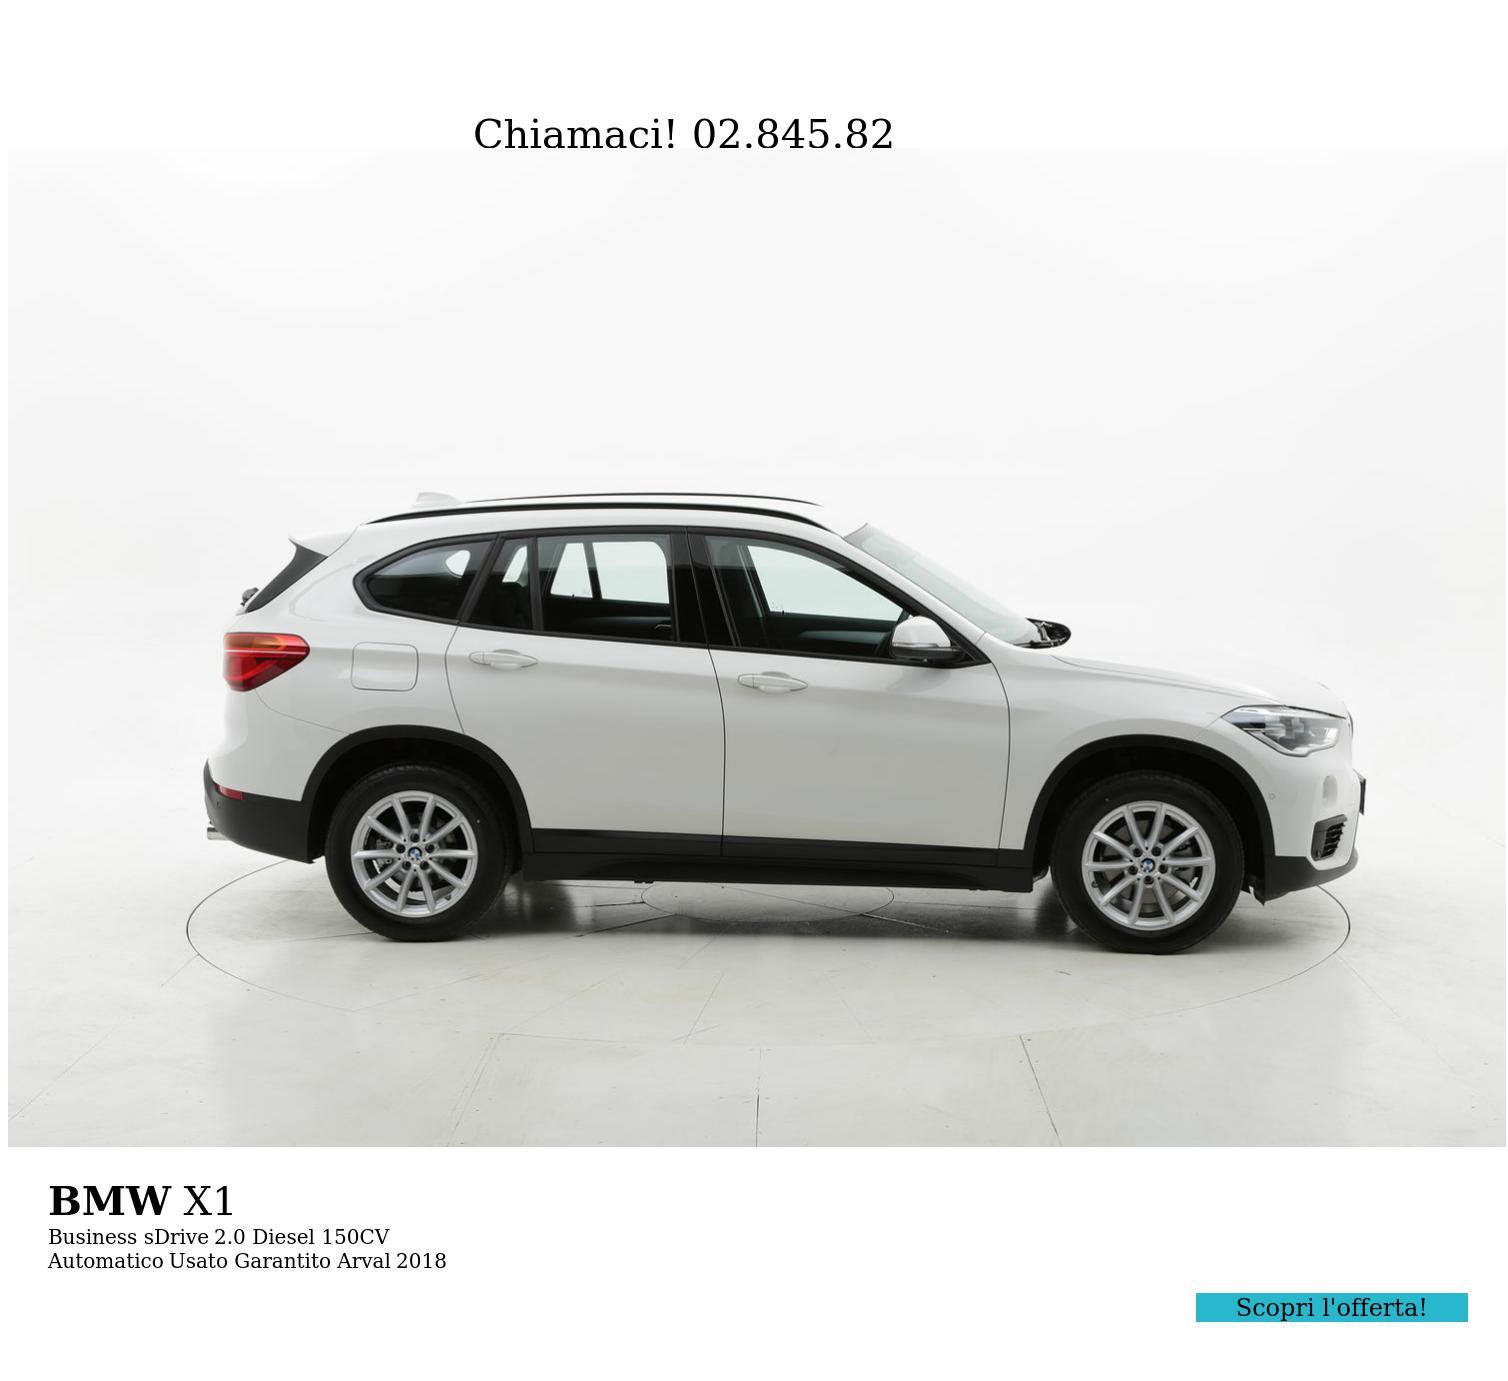 BMW X1 Business sDrive km 0 diesel bianca | brumbrum